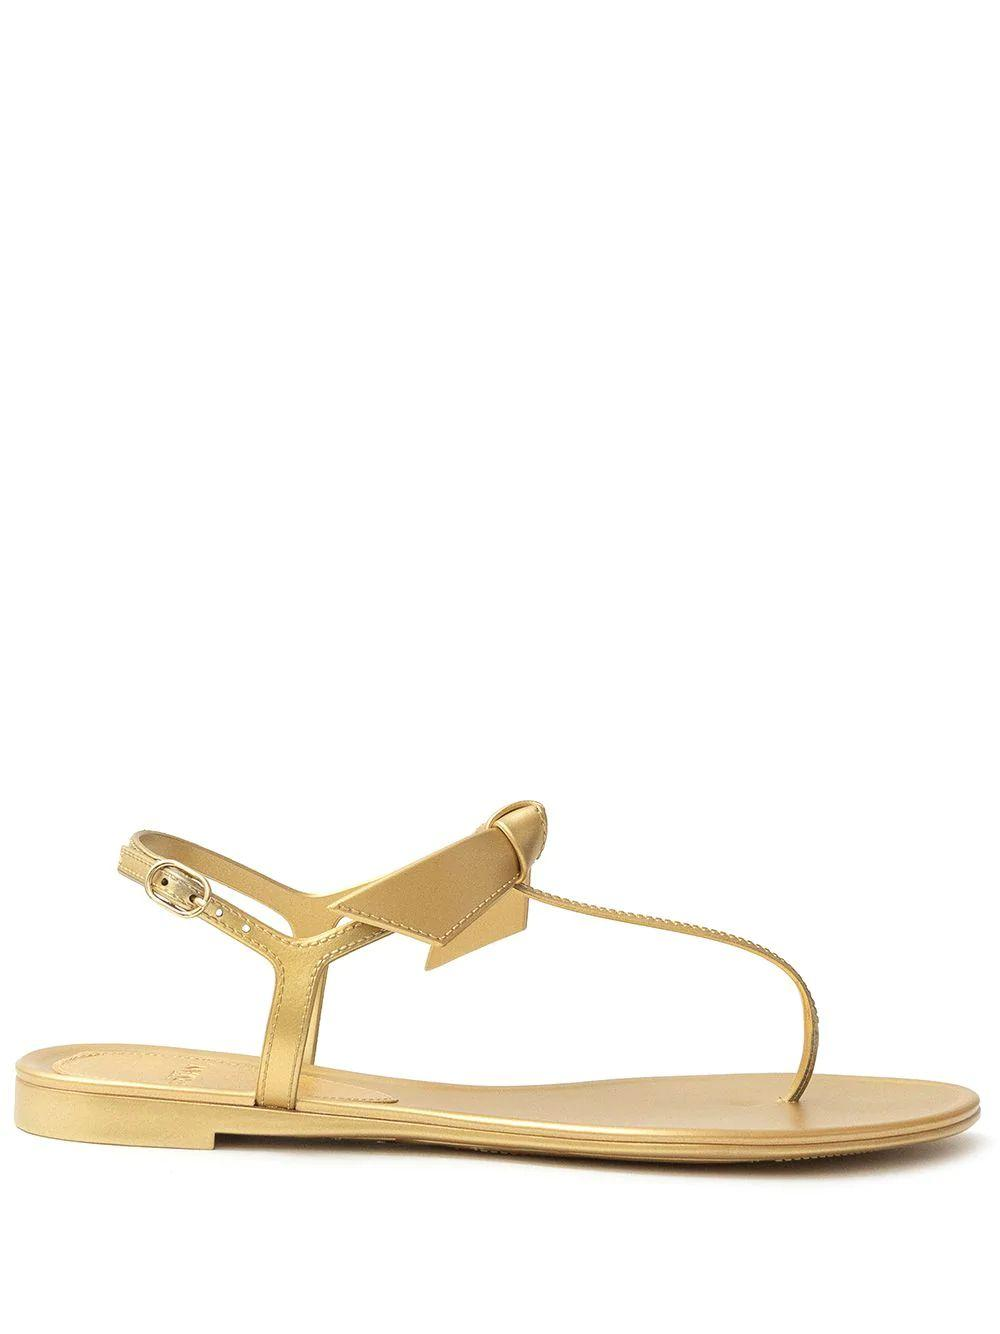 Clarita Metallic Jelly Sandal Item # B3530600020004